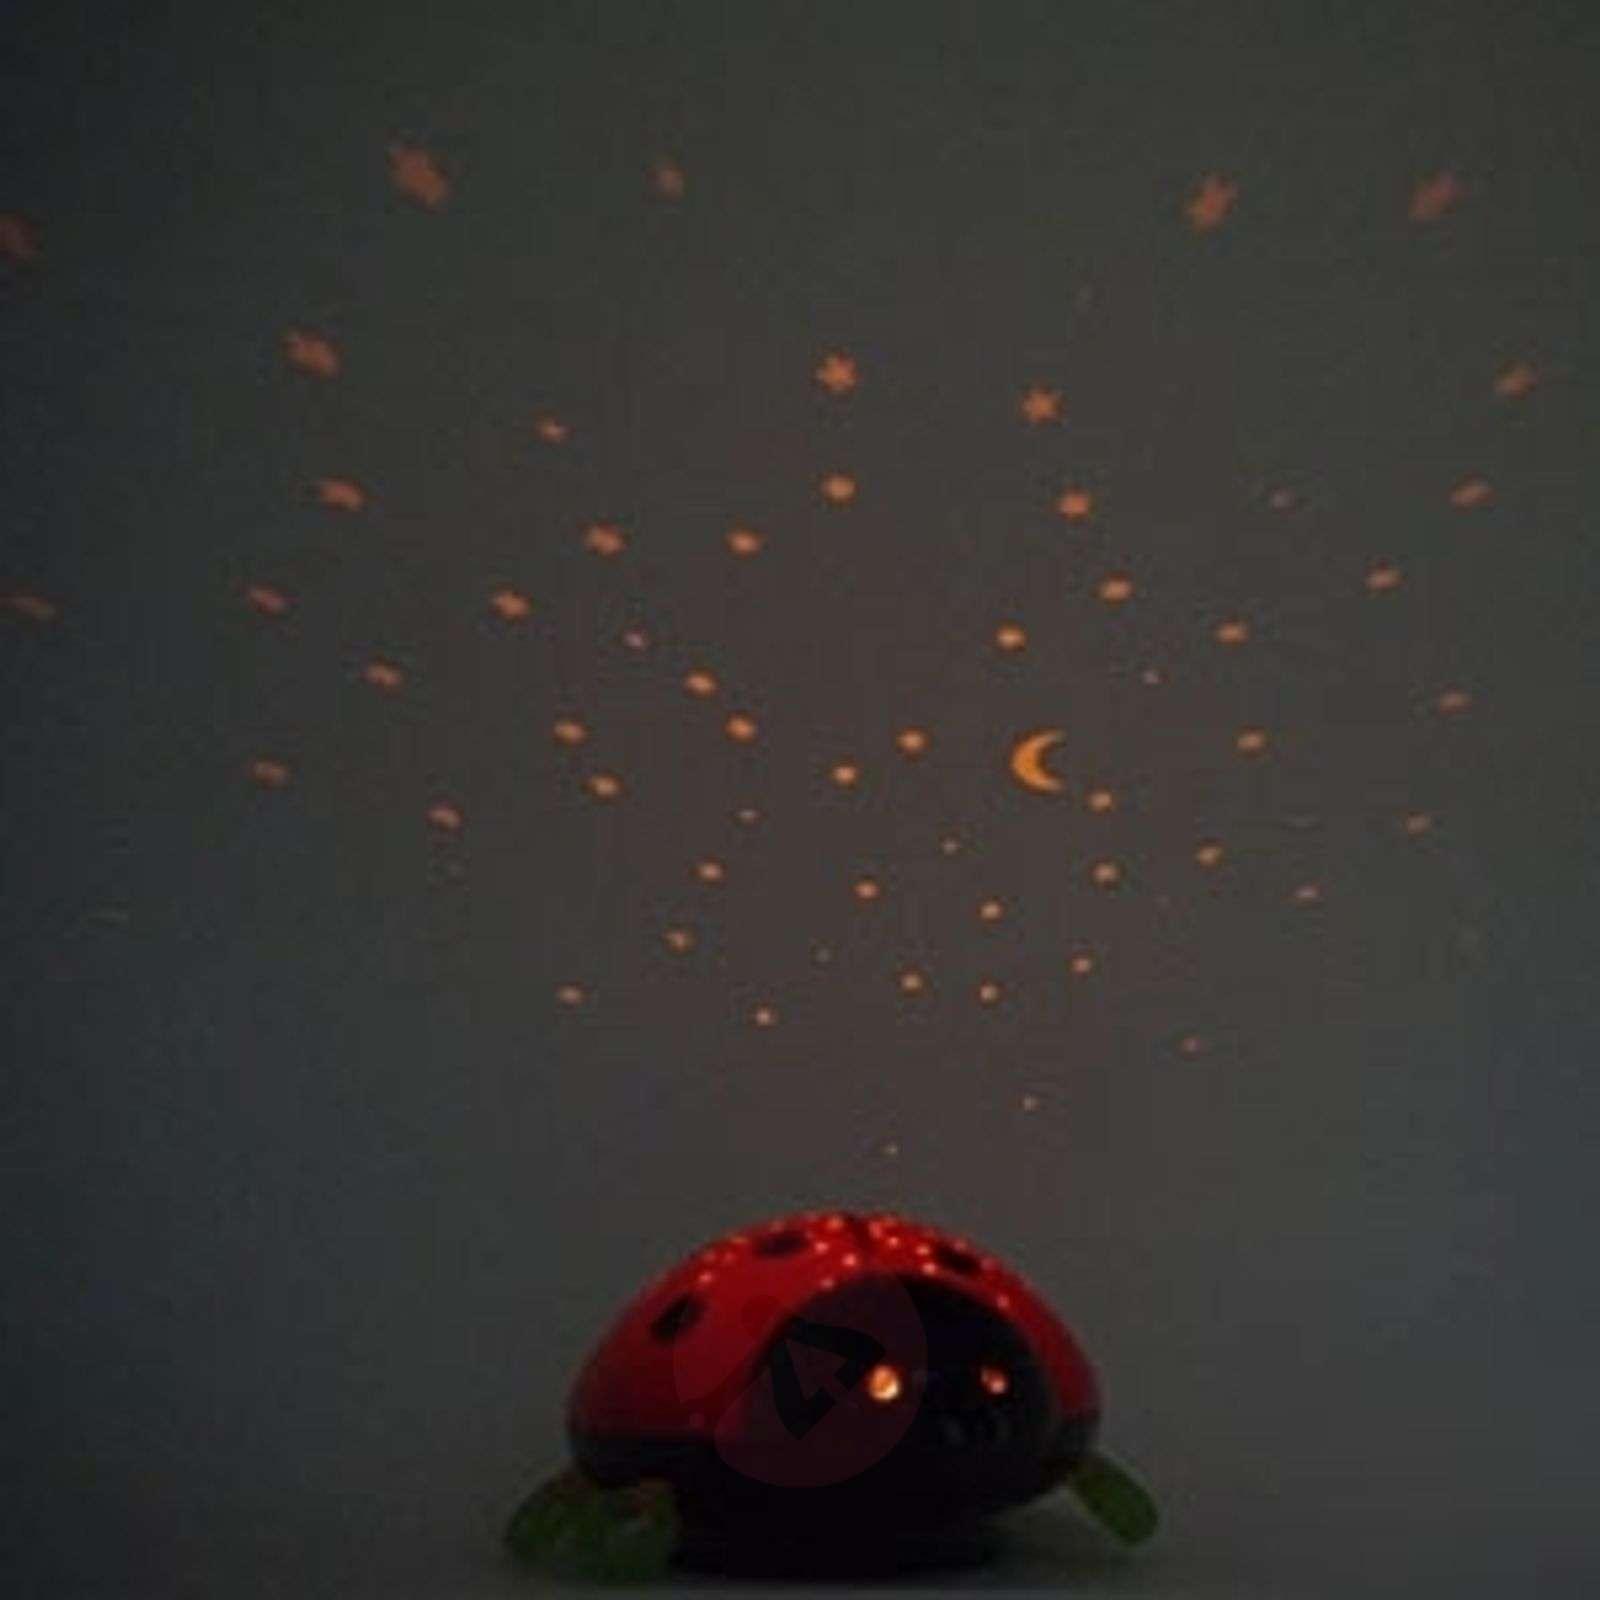 Beetlestar LED Night Light Starry Night-5400207-01